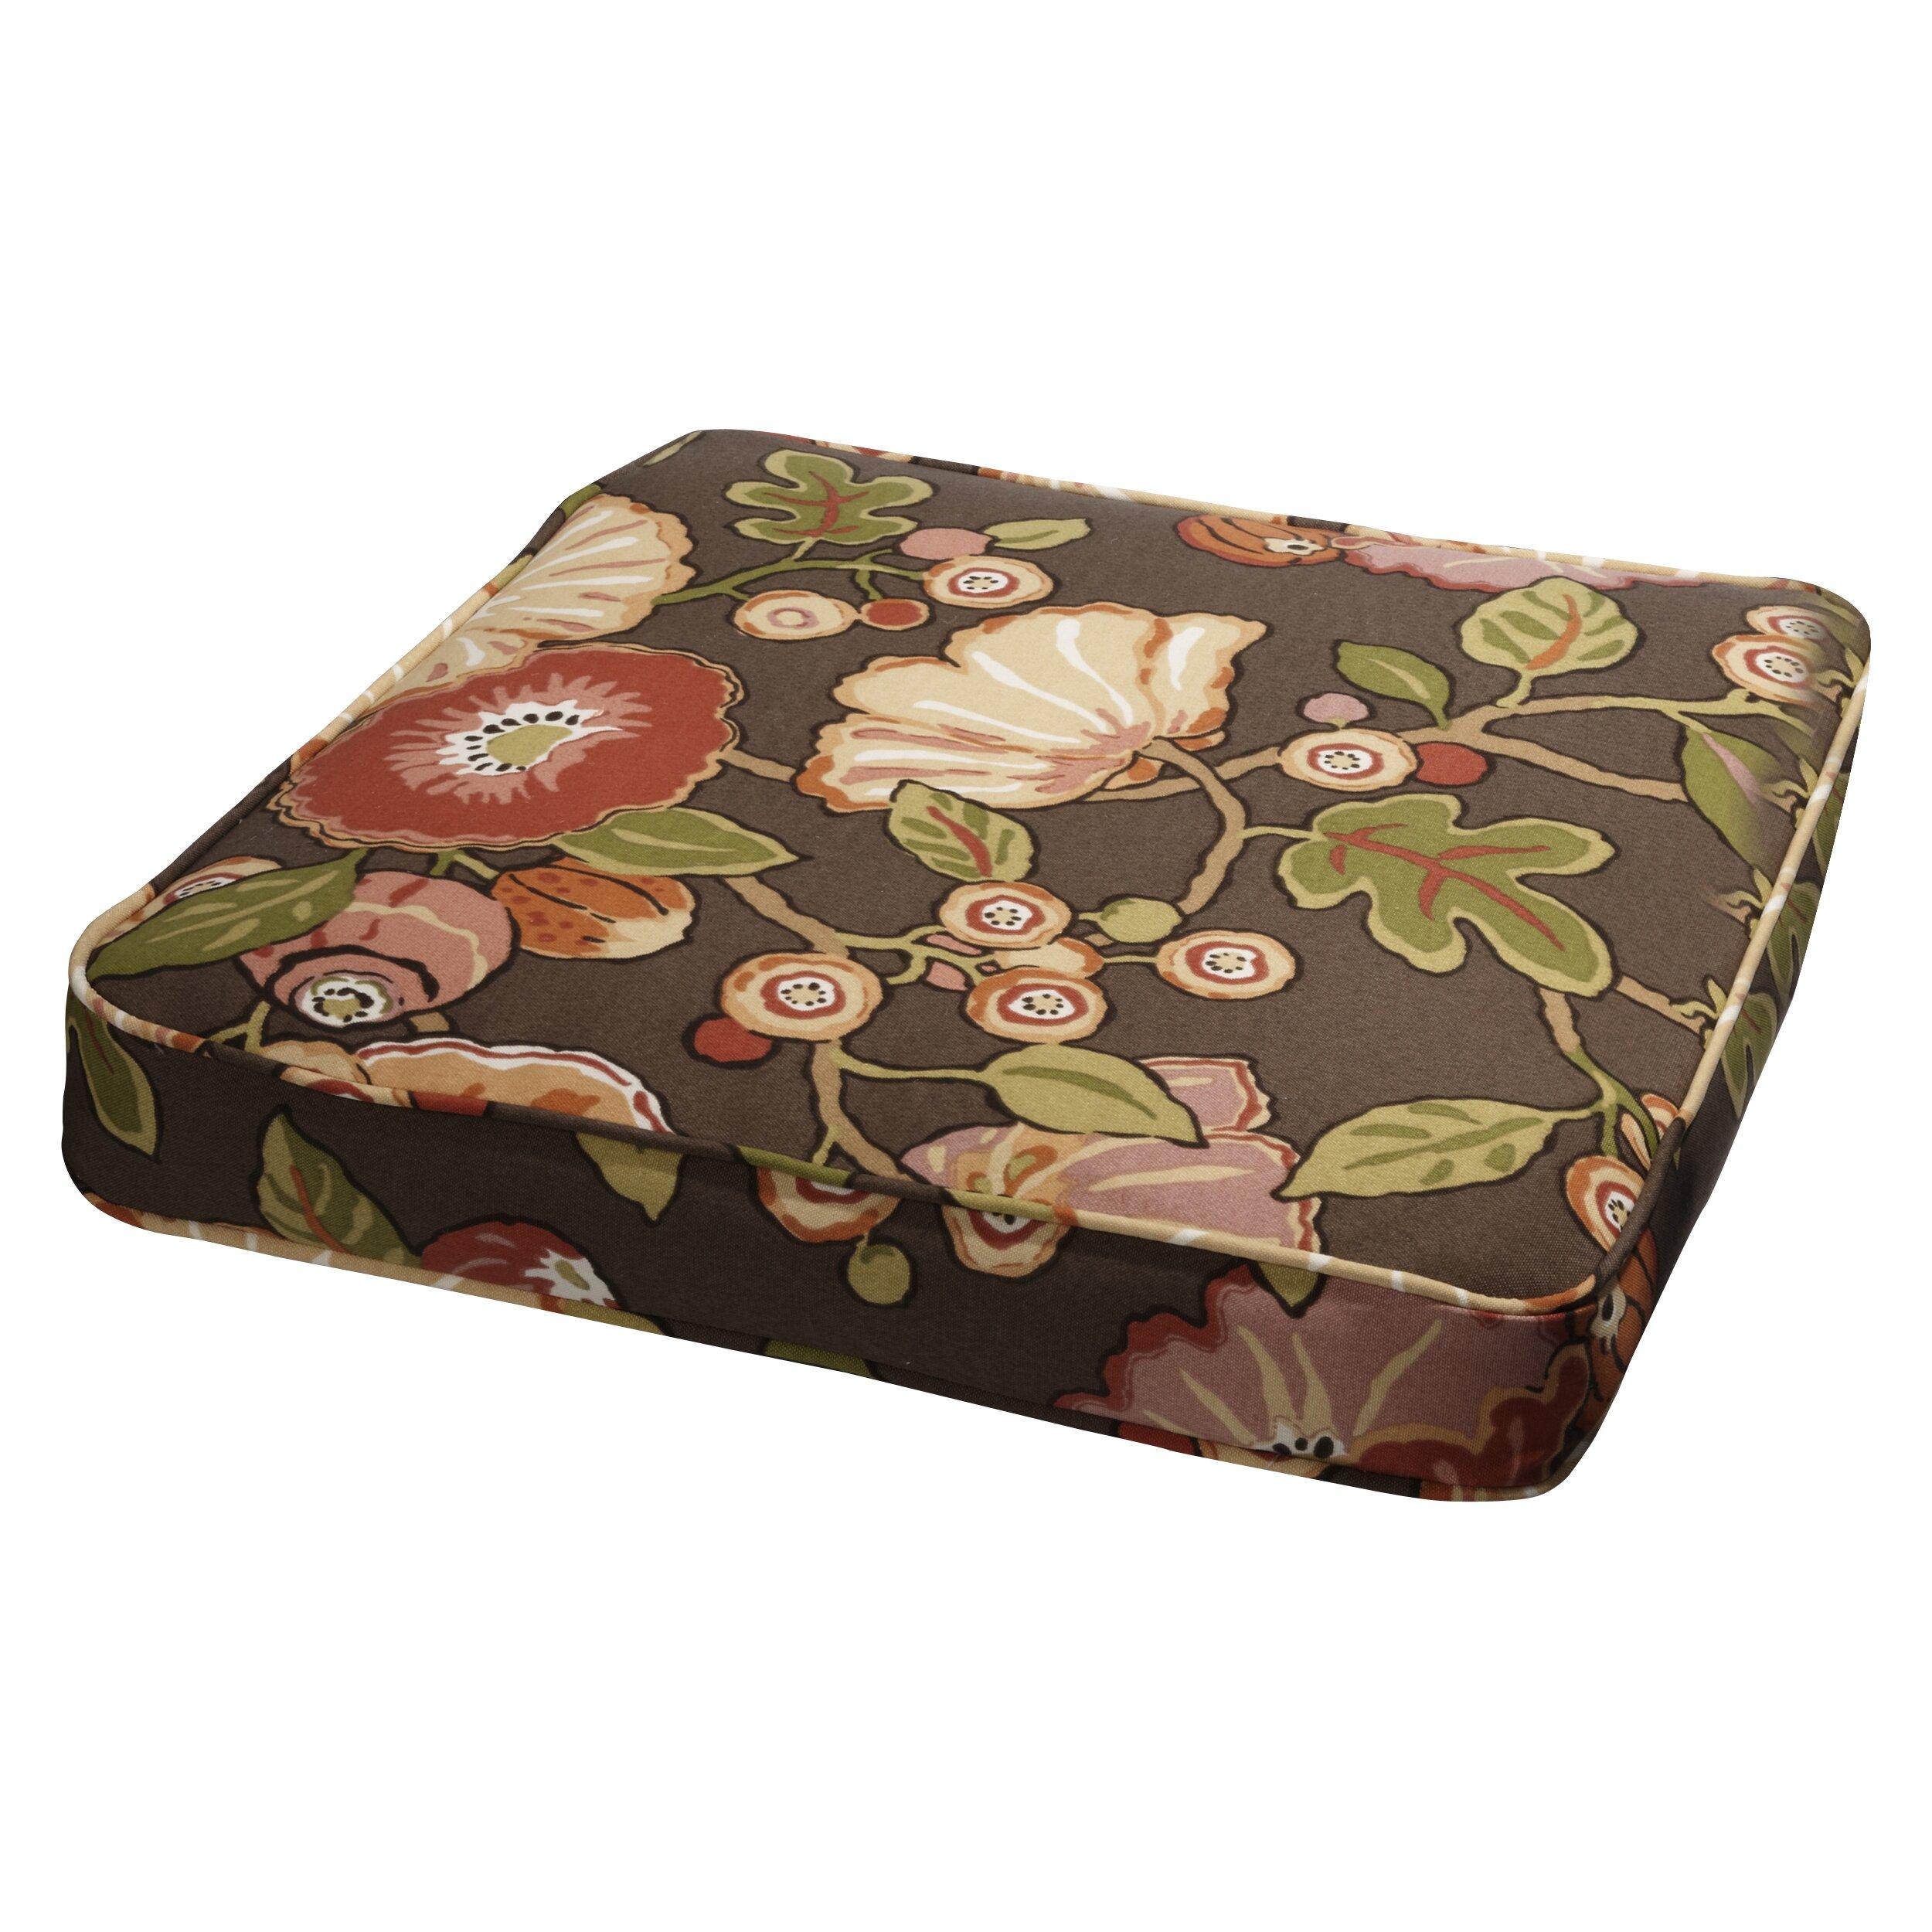 Mozaic Company Stella Outdoor Dining Chair Cushion